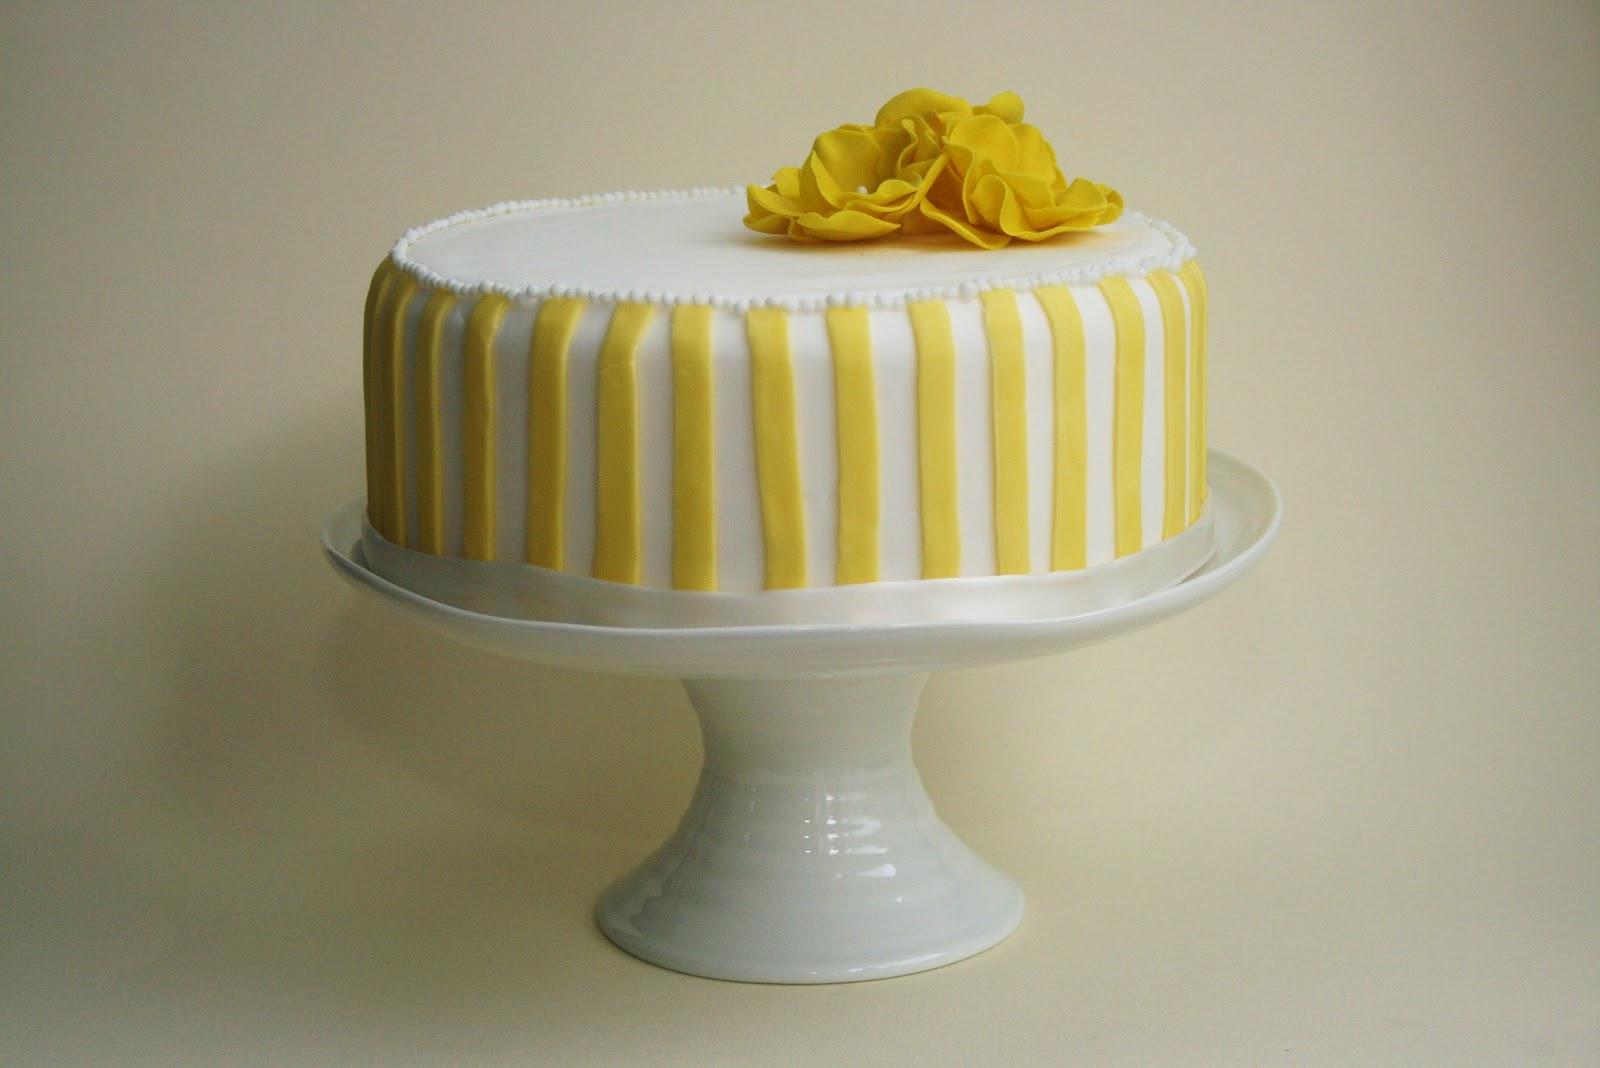 Lemon Cake Decoration  Viewing Gallery ~ 162105_Lemon Cake Decoration Ideas